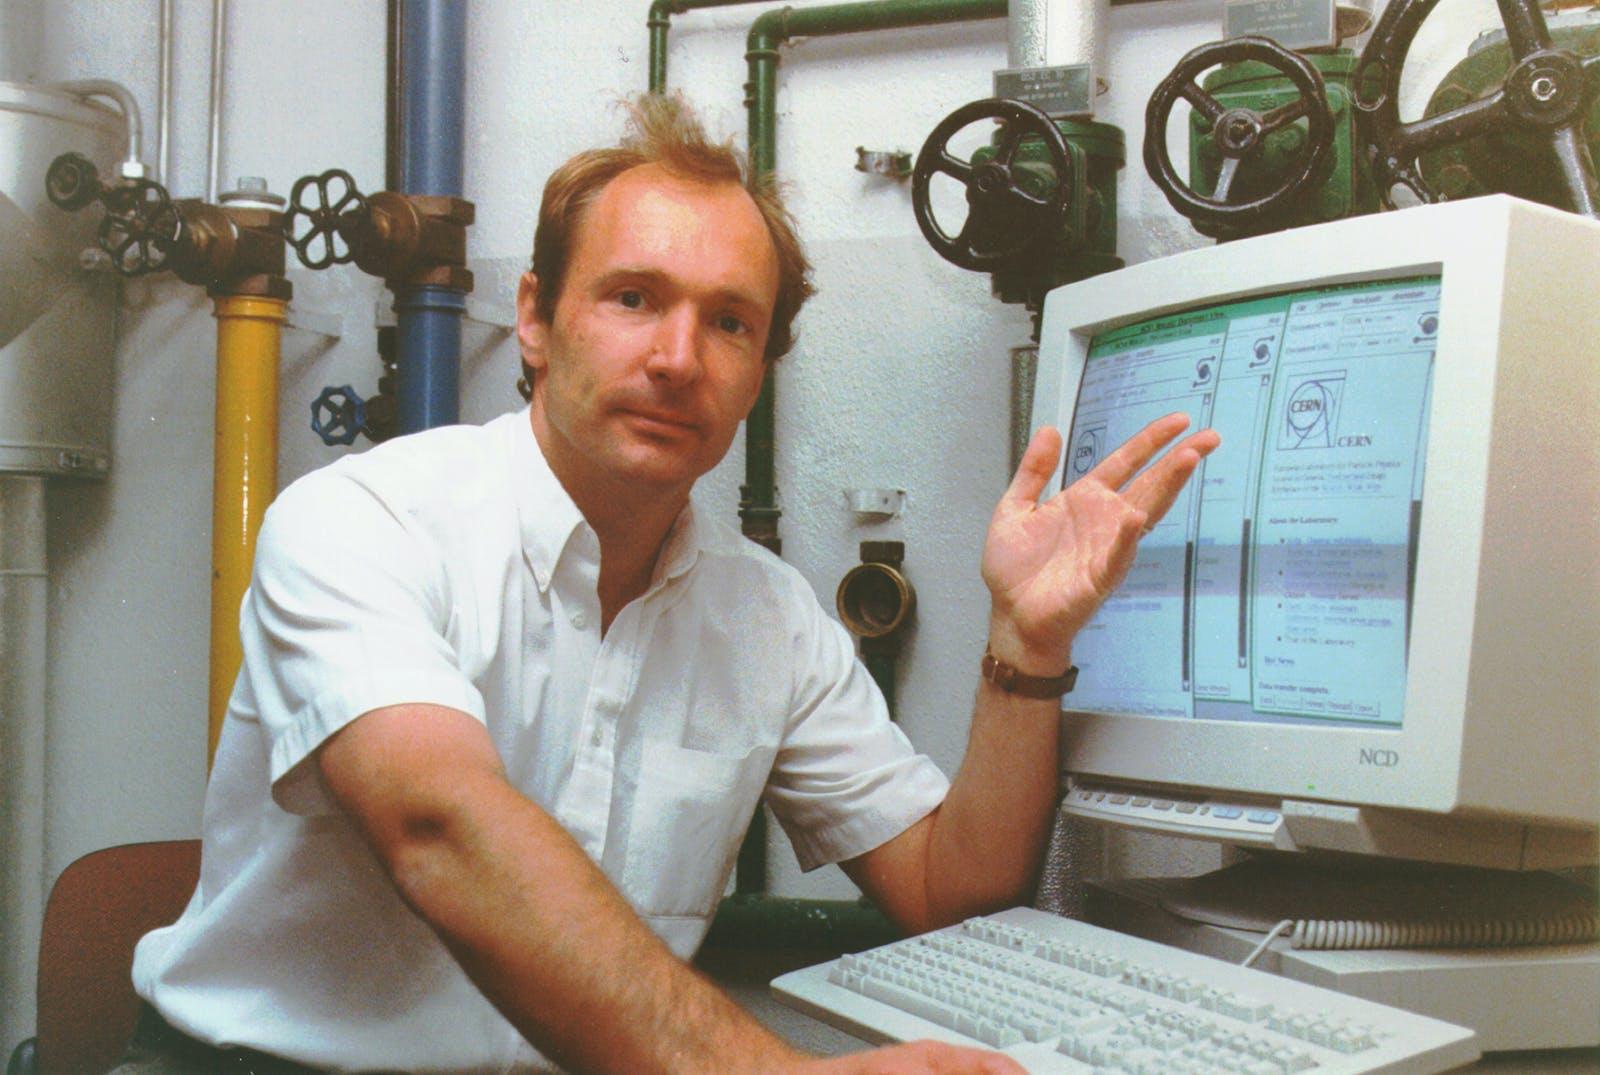 Tim Berners-Lee's World Wide Web Source Code NFT Sold for $ 5.4 Million